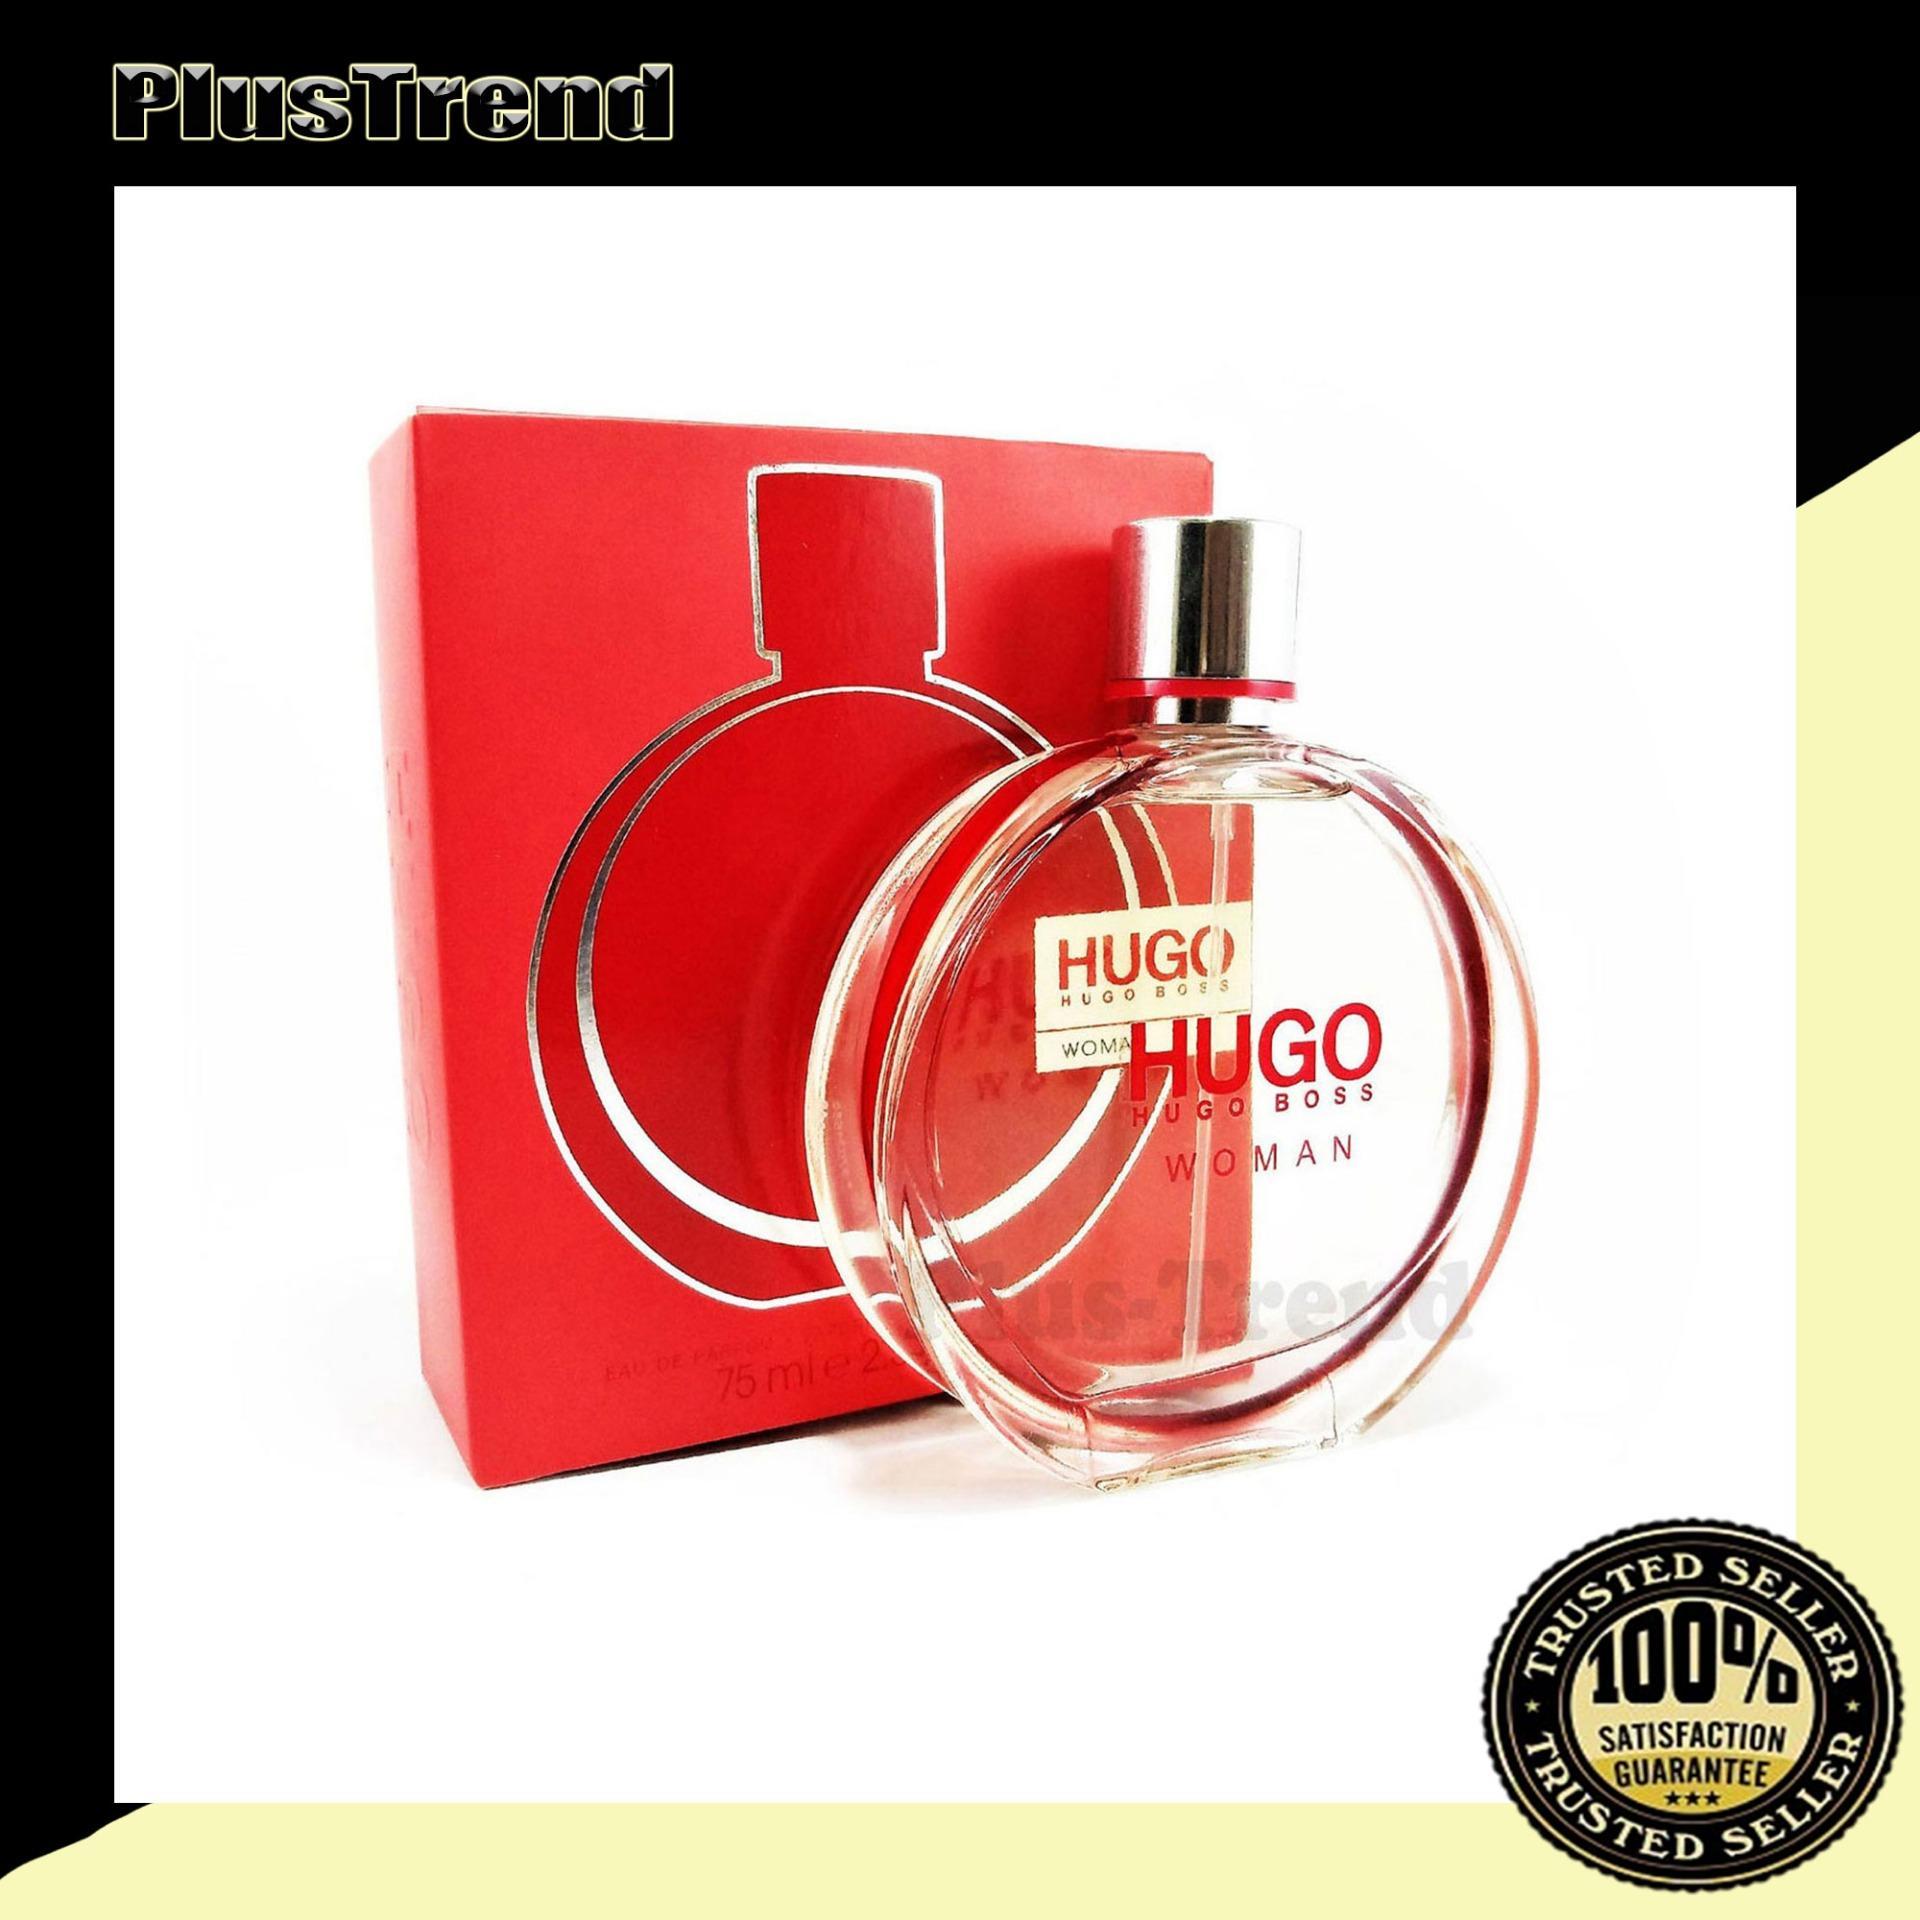 b2538d82b1efa1 Women's Cologne brands - Women's Fragrance on sale, prices, set ...